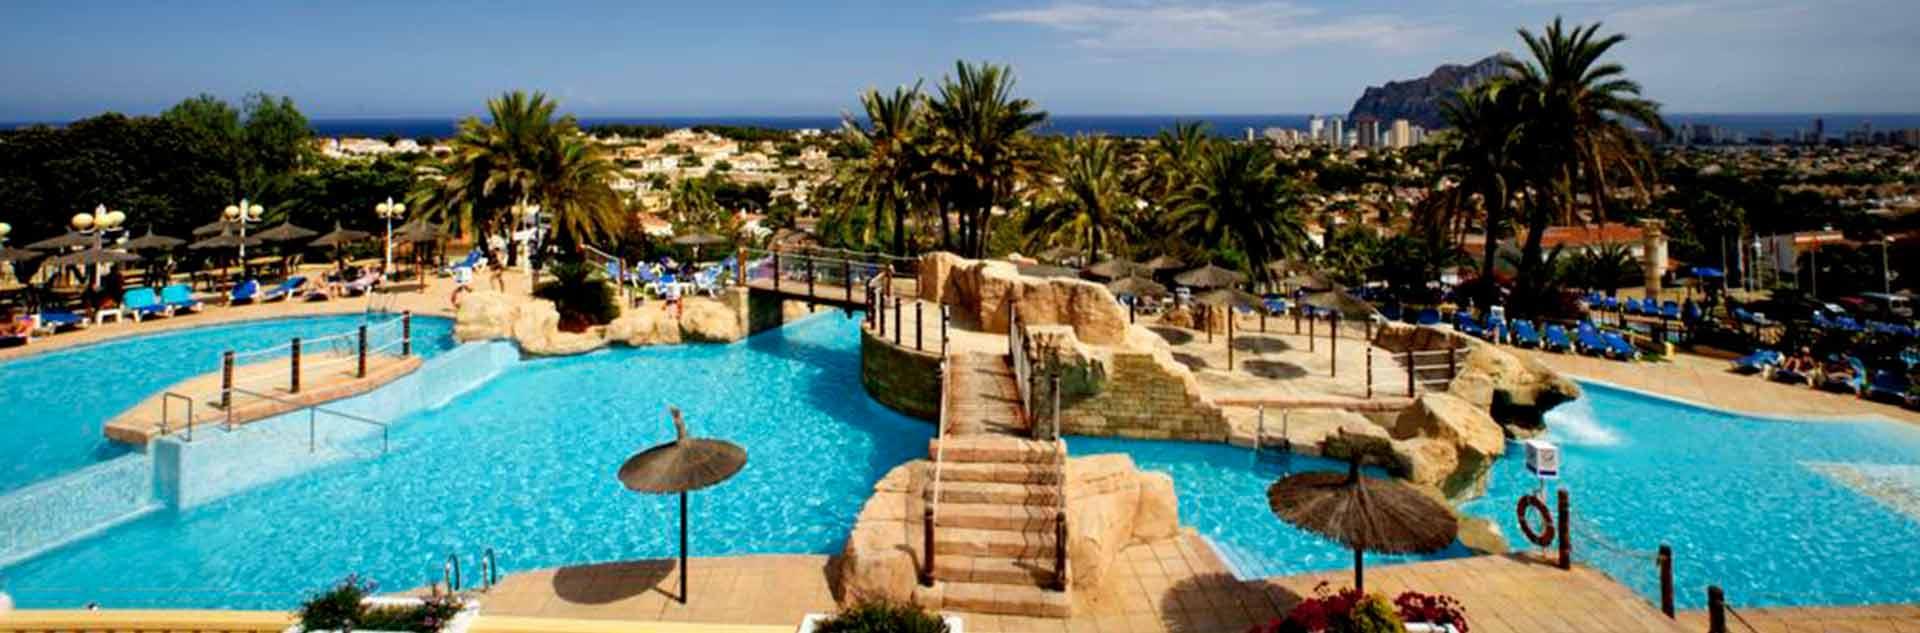 Piscinas exteriores del hotel AR Impertial Park Spa Resort de Calpe